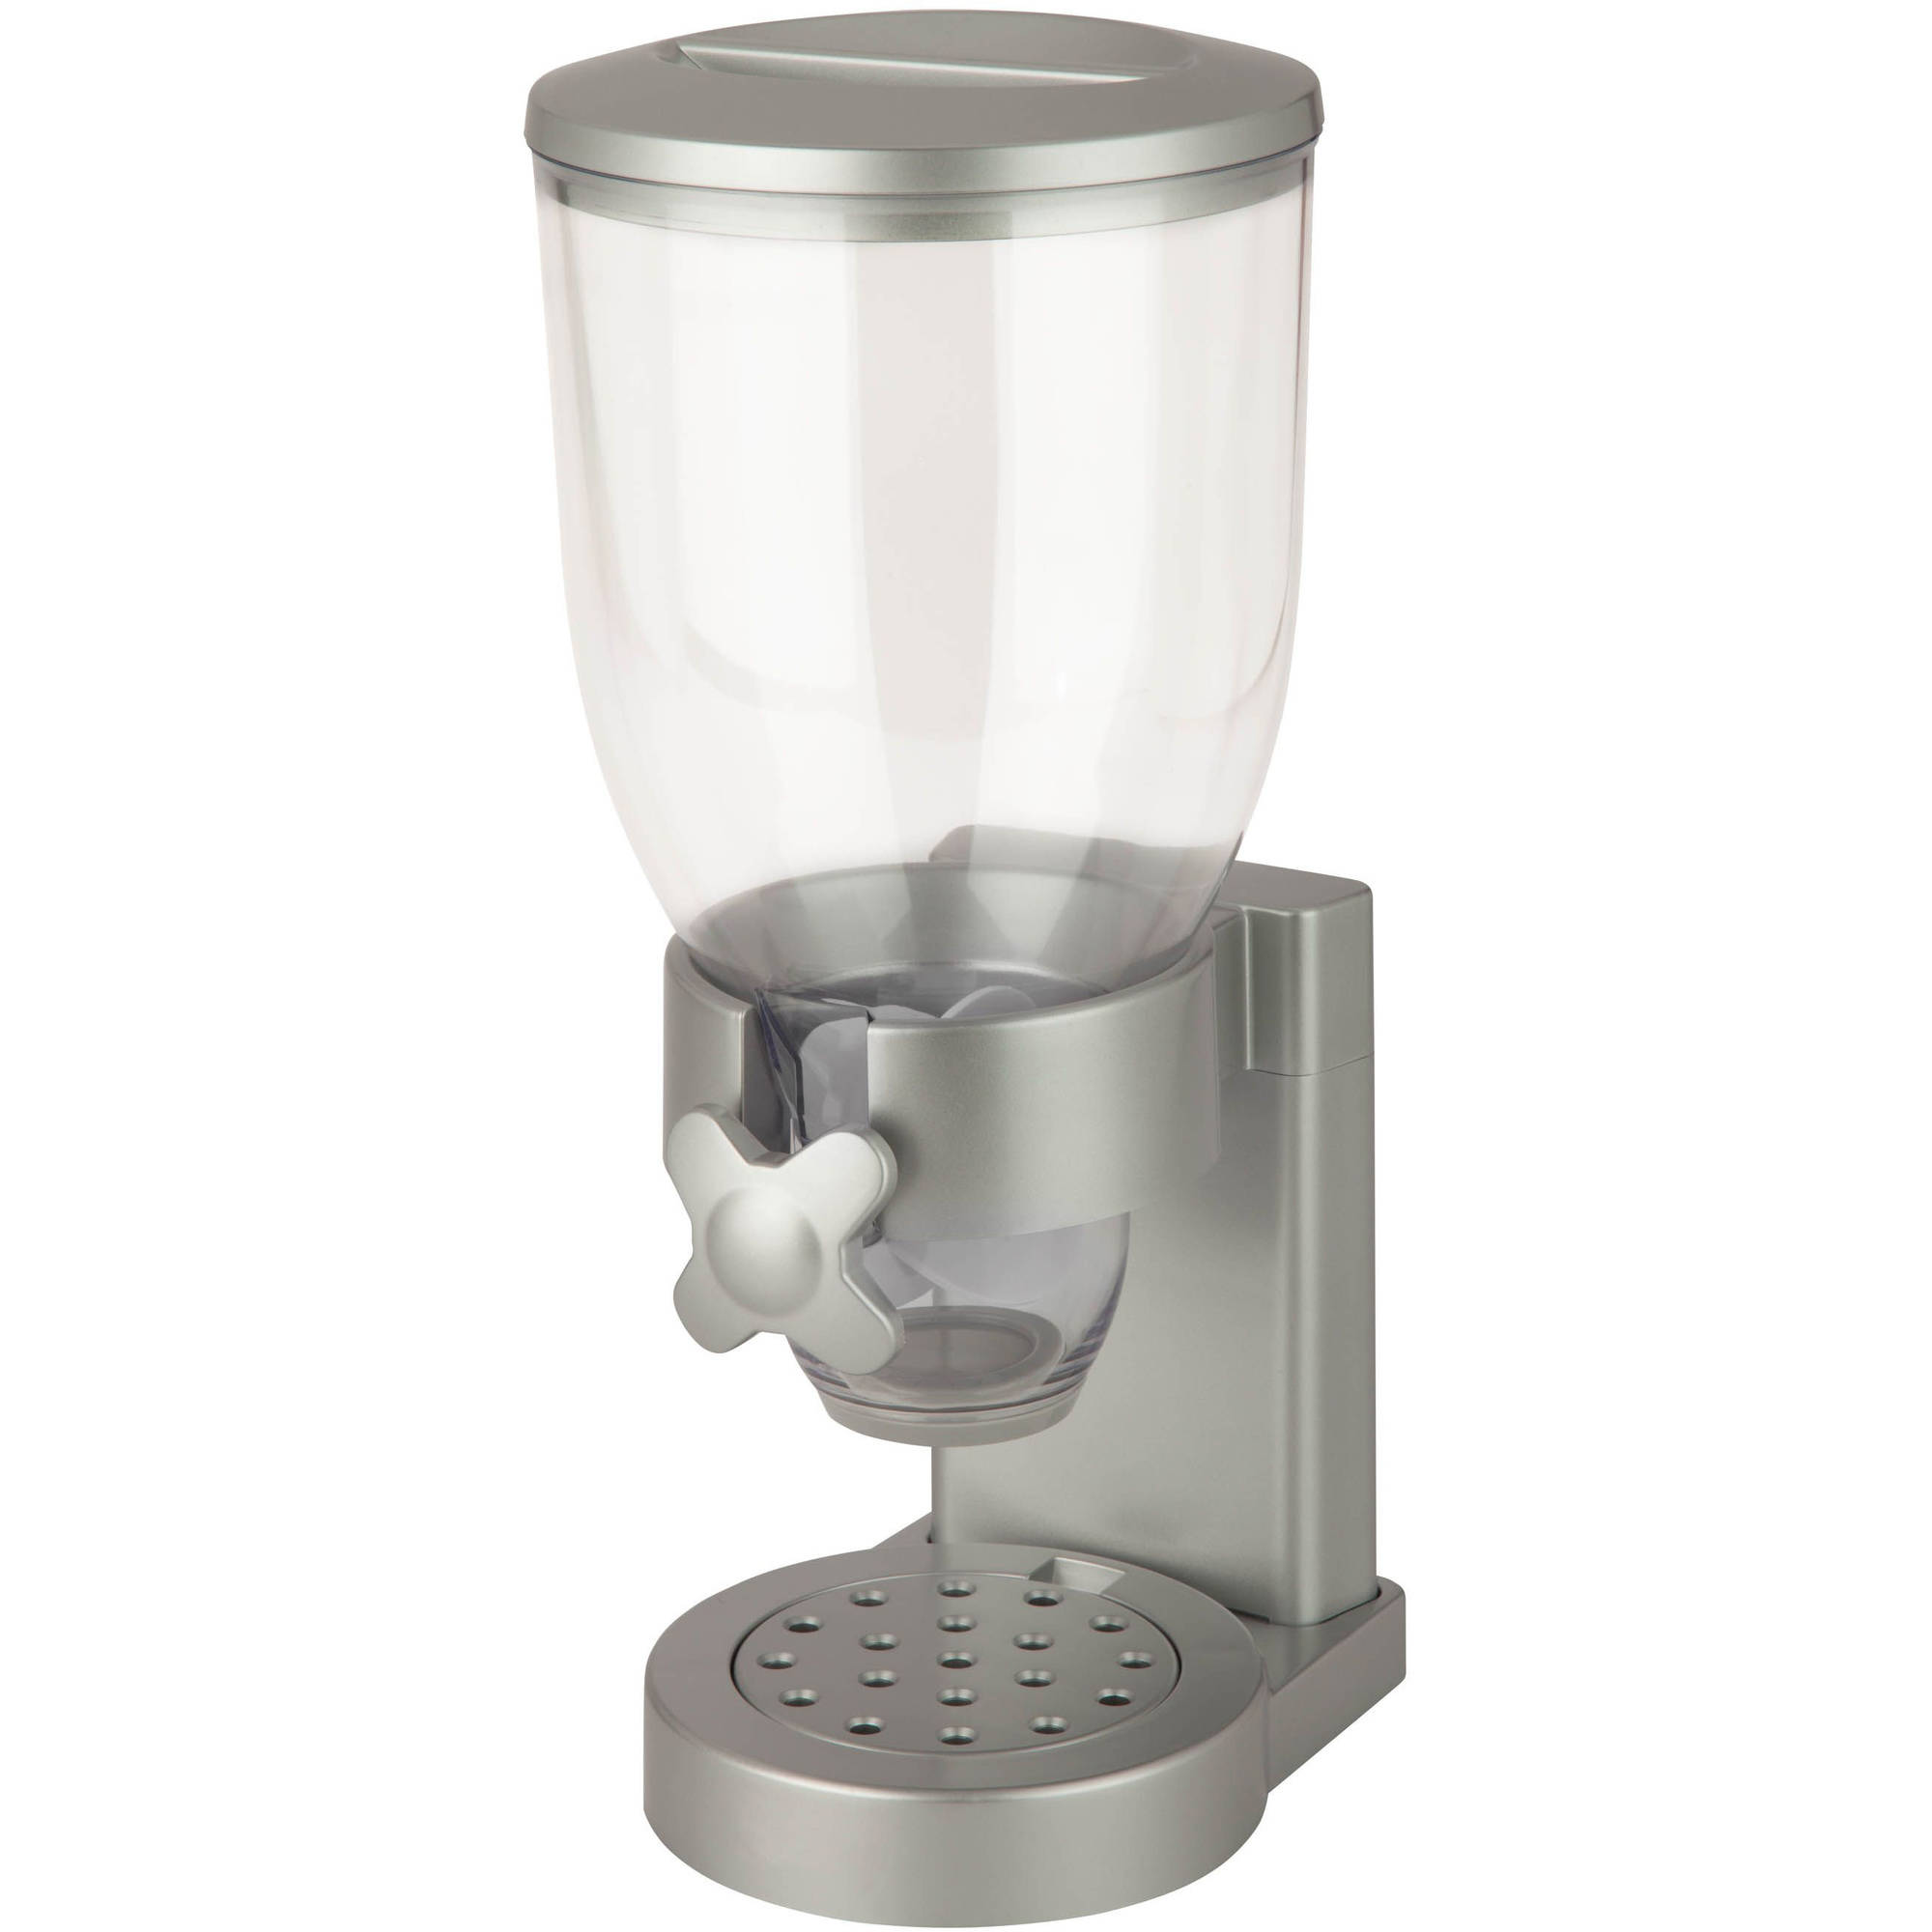 Zevro Original Indispensable Single 17.5 oz Dispenser, Silver/Chrome